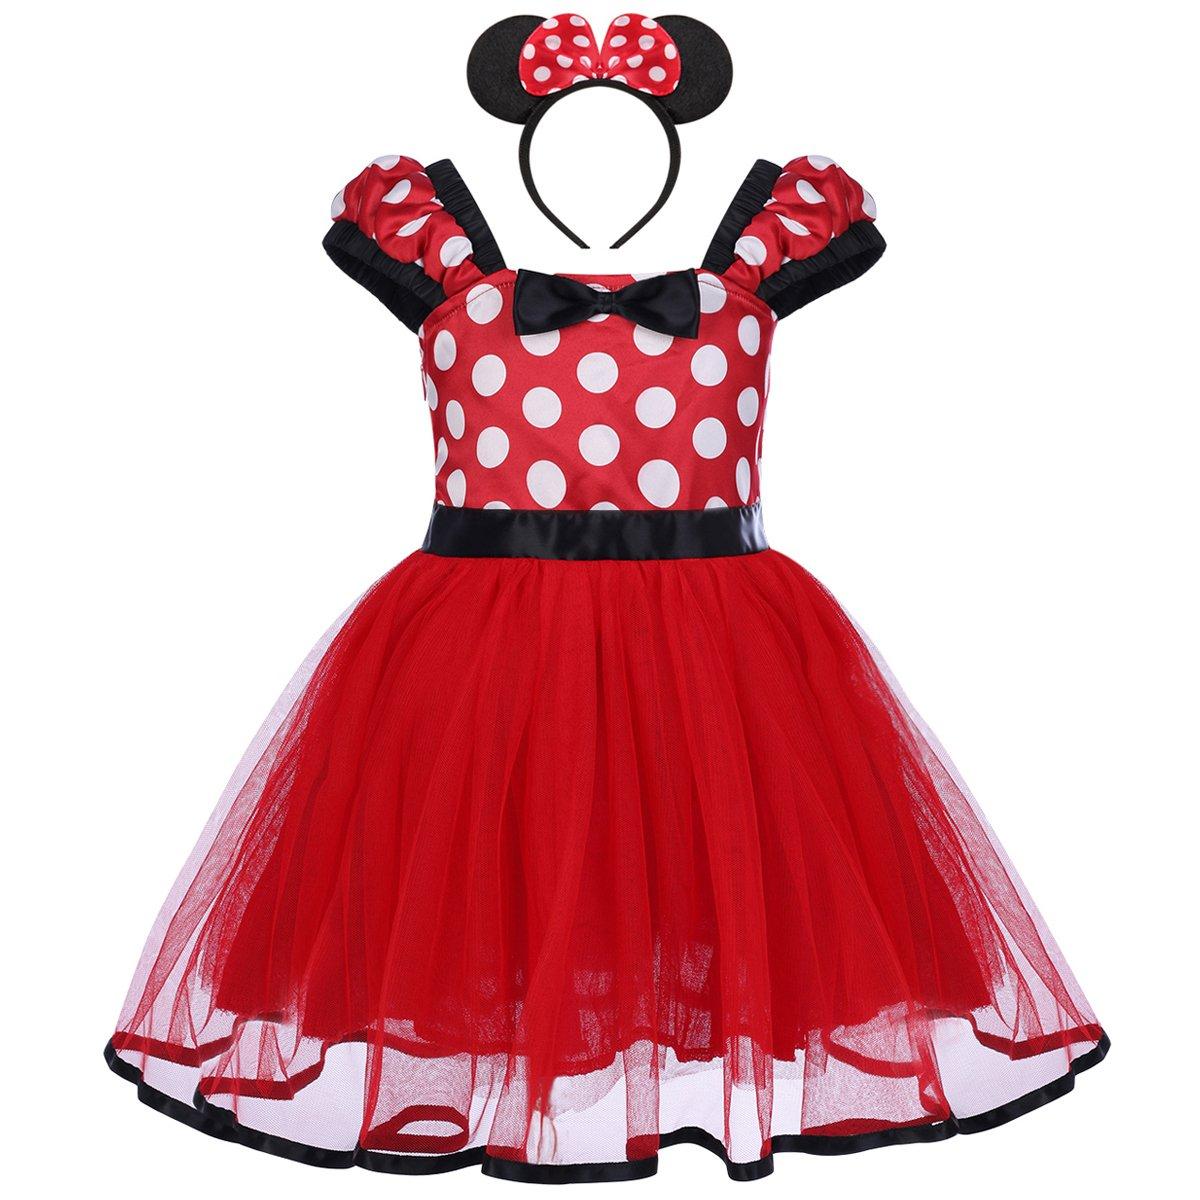 Costume Baby Girl Tutu Dress Mouse Ear Headband Polka Dot First Birthday Halloween Fancy Dress Up Princess Outfits